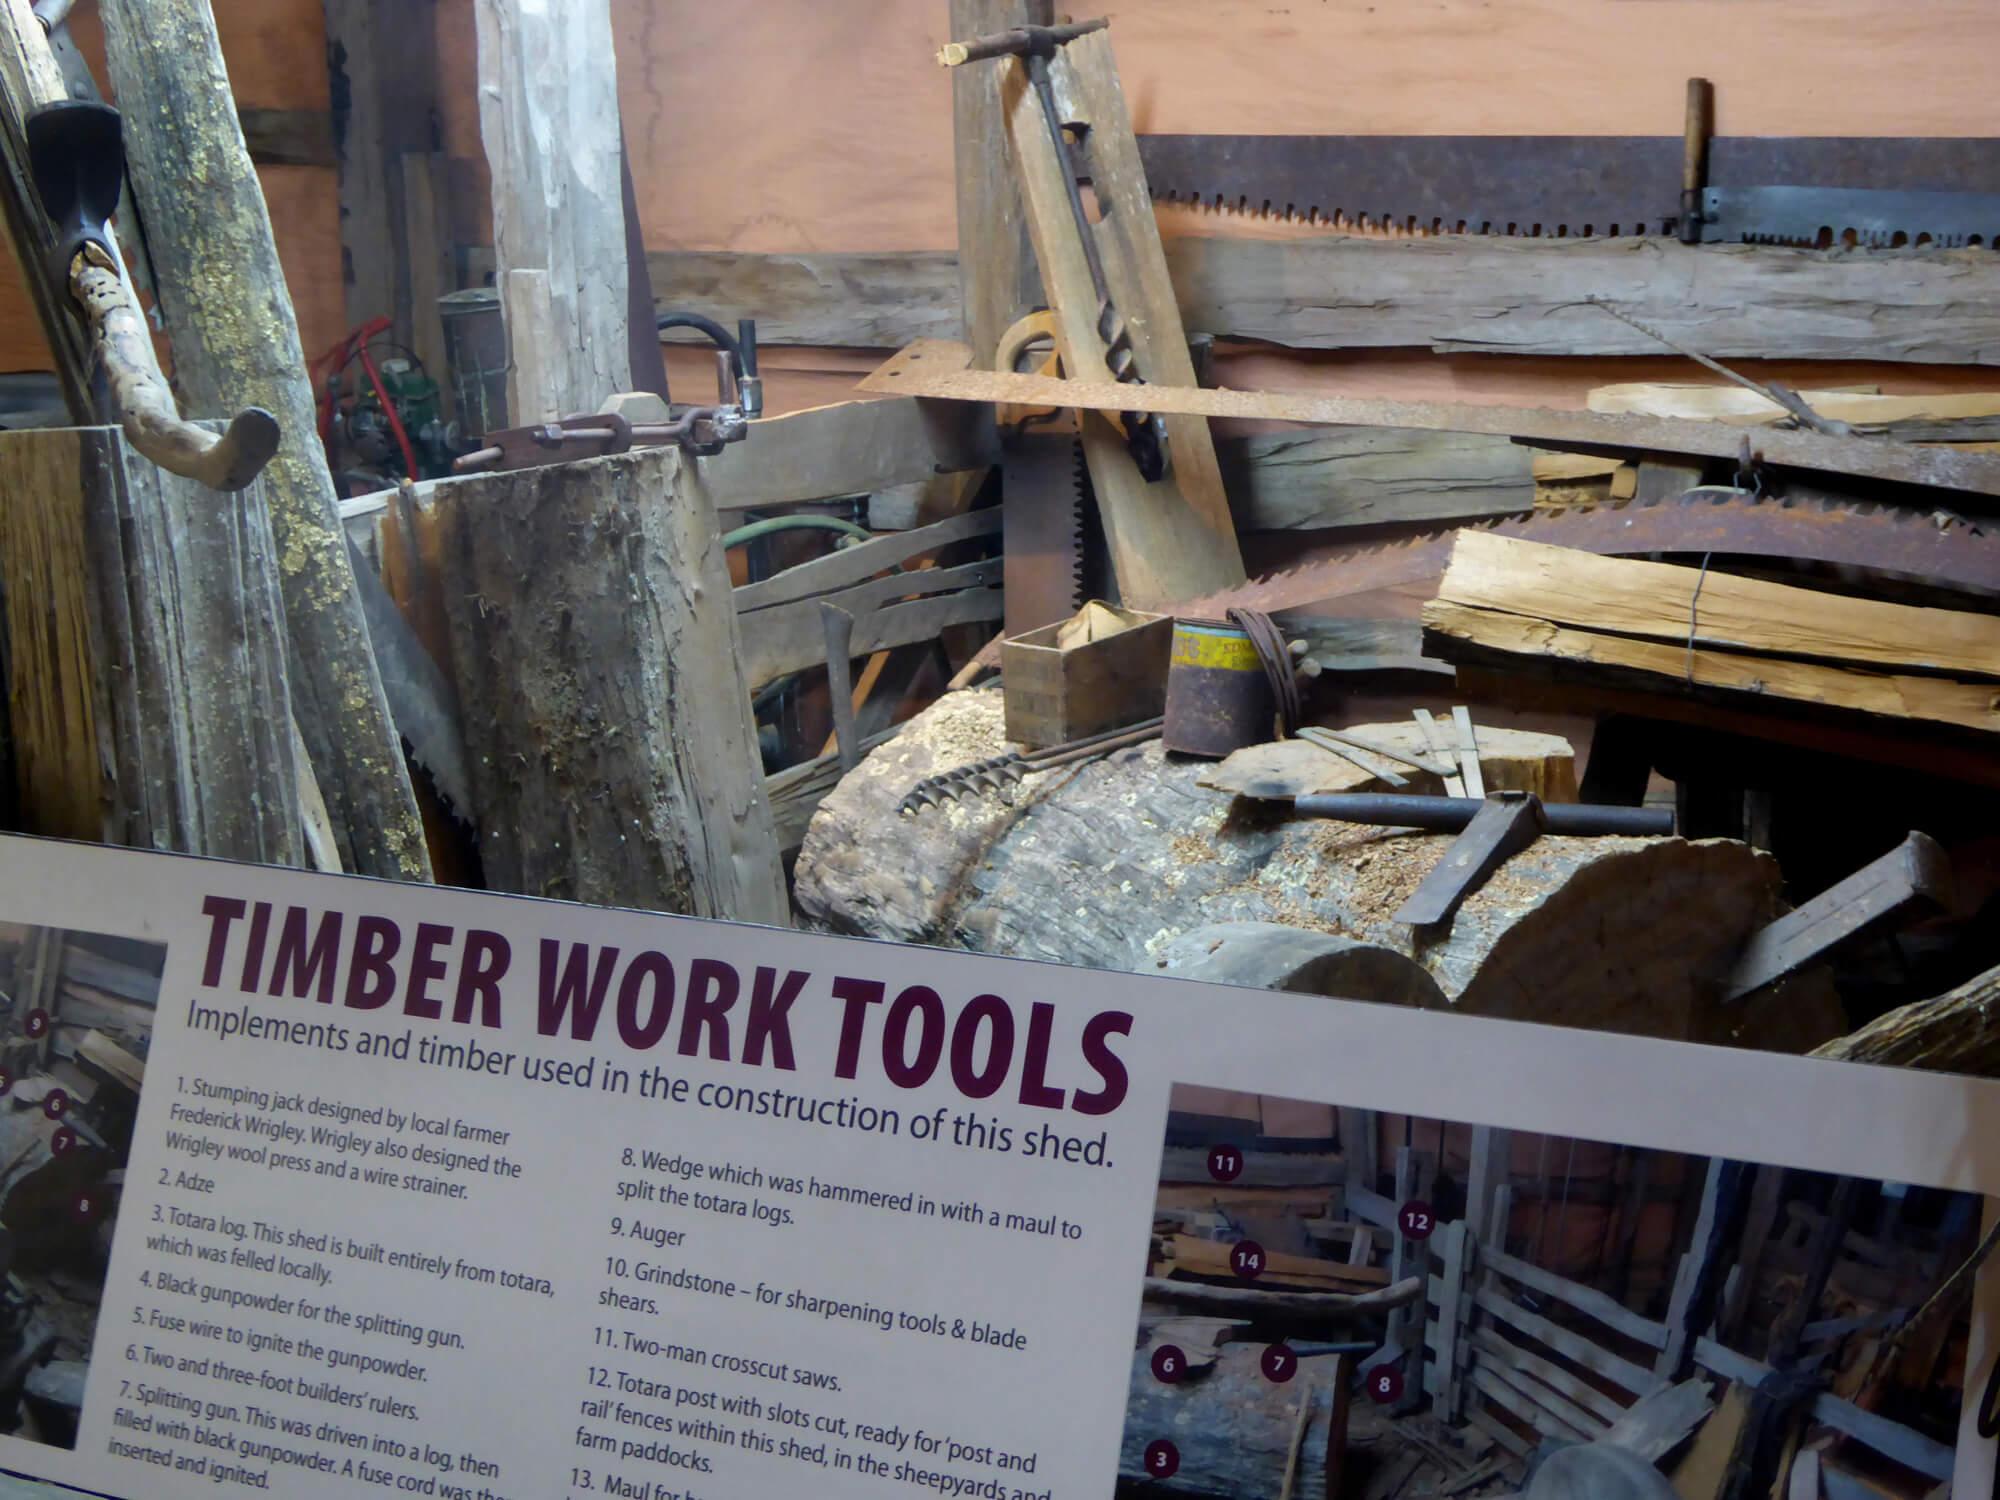 Timber-work-tools.jpg